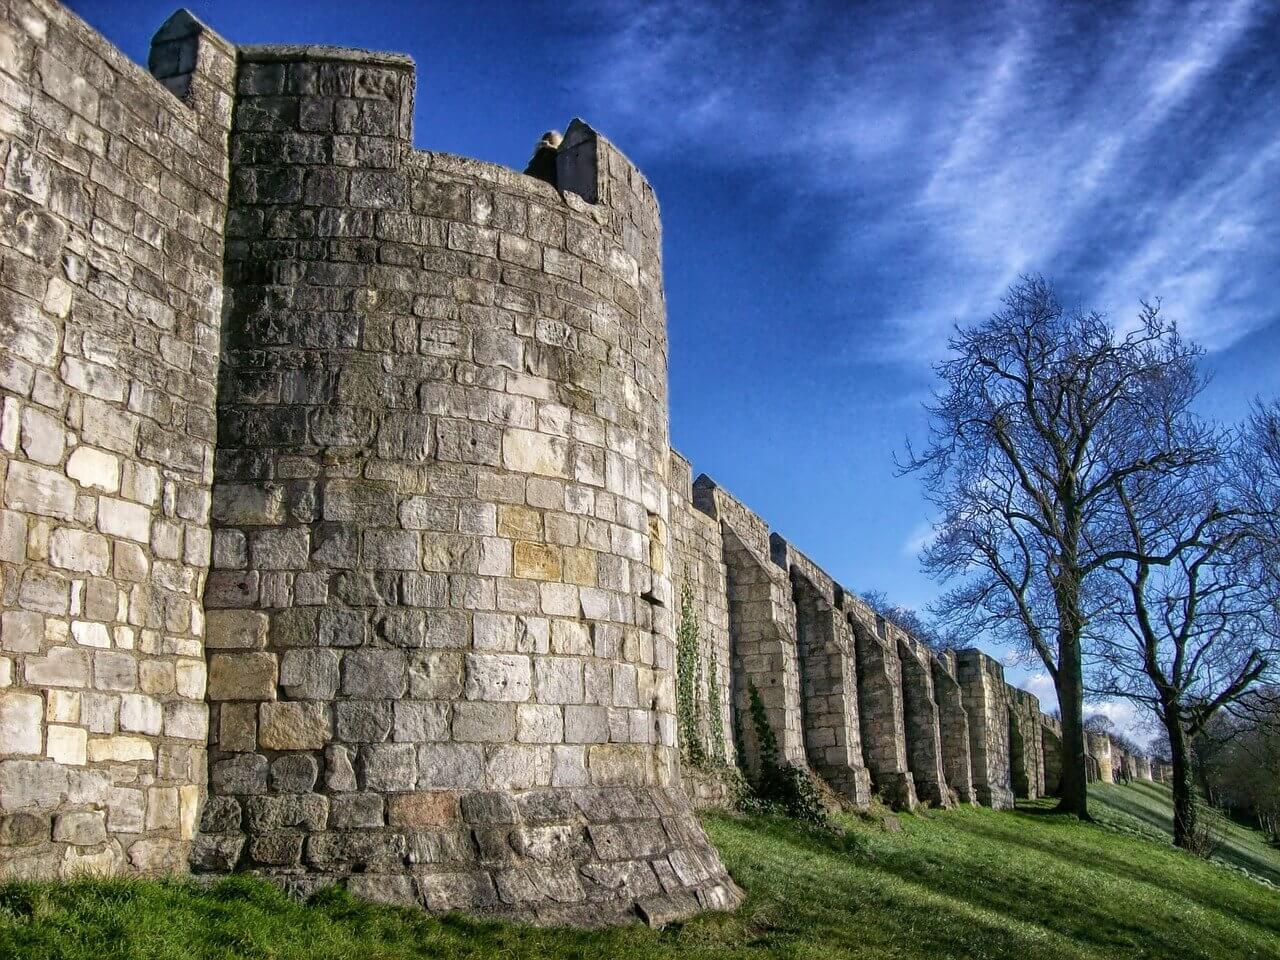 North Yorkshire city walls